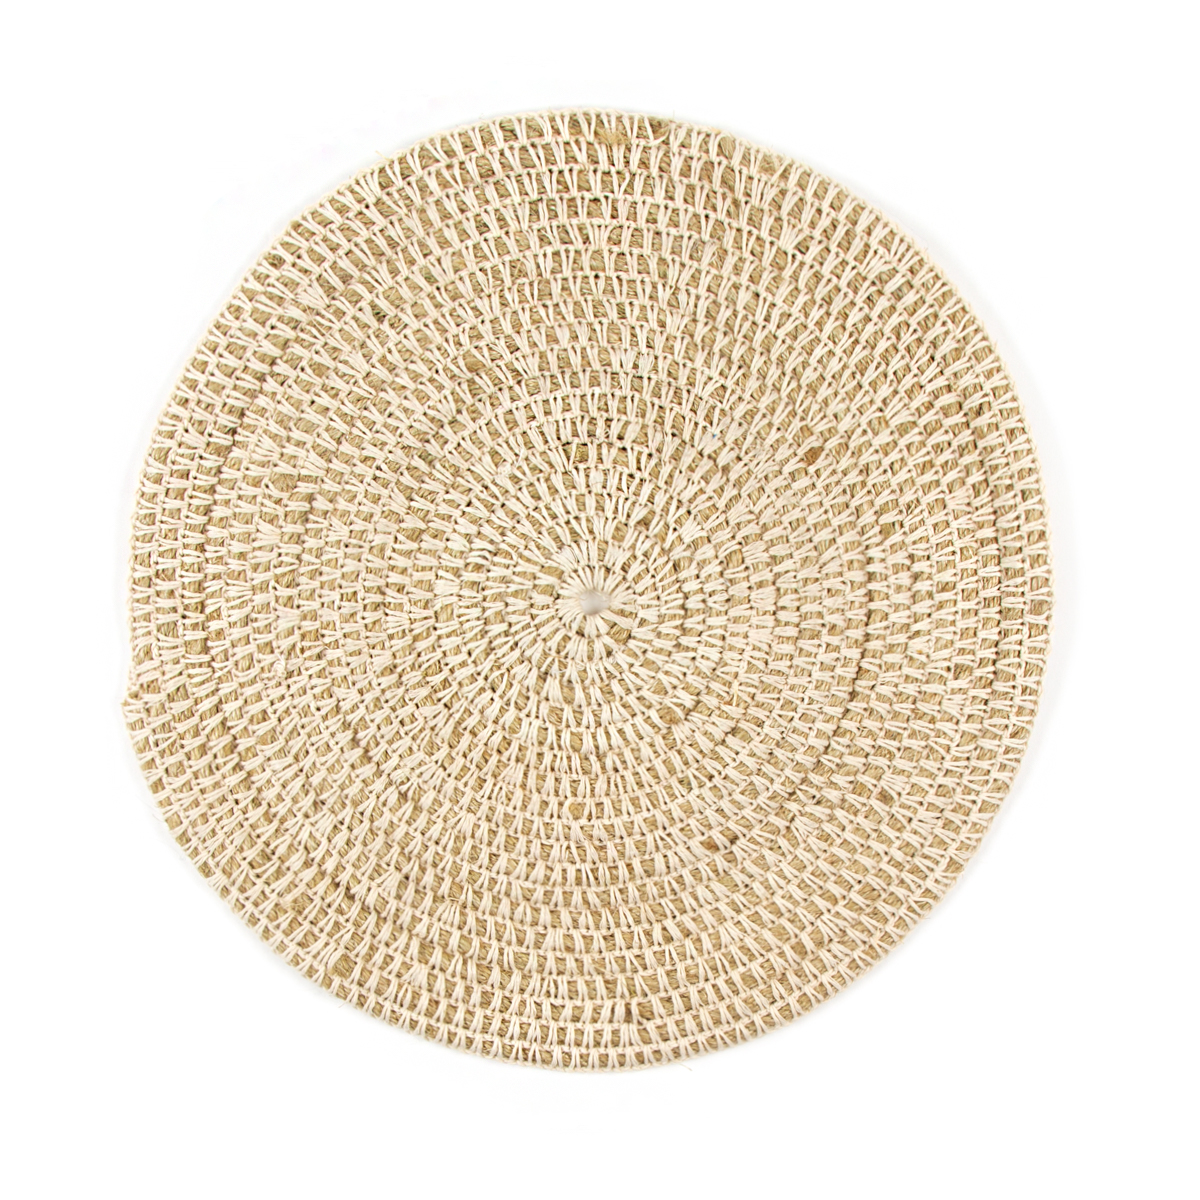 Soha large crocheted trivet: The Master Peace, Lebanon